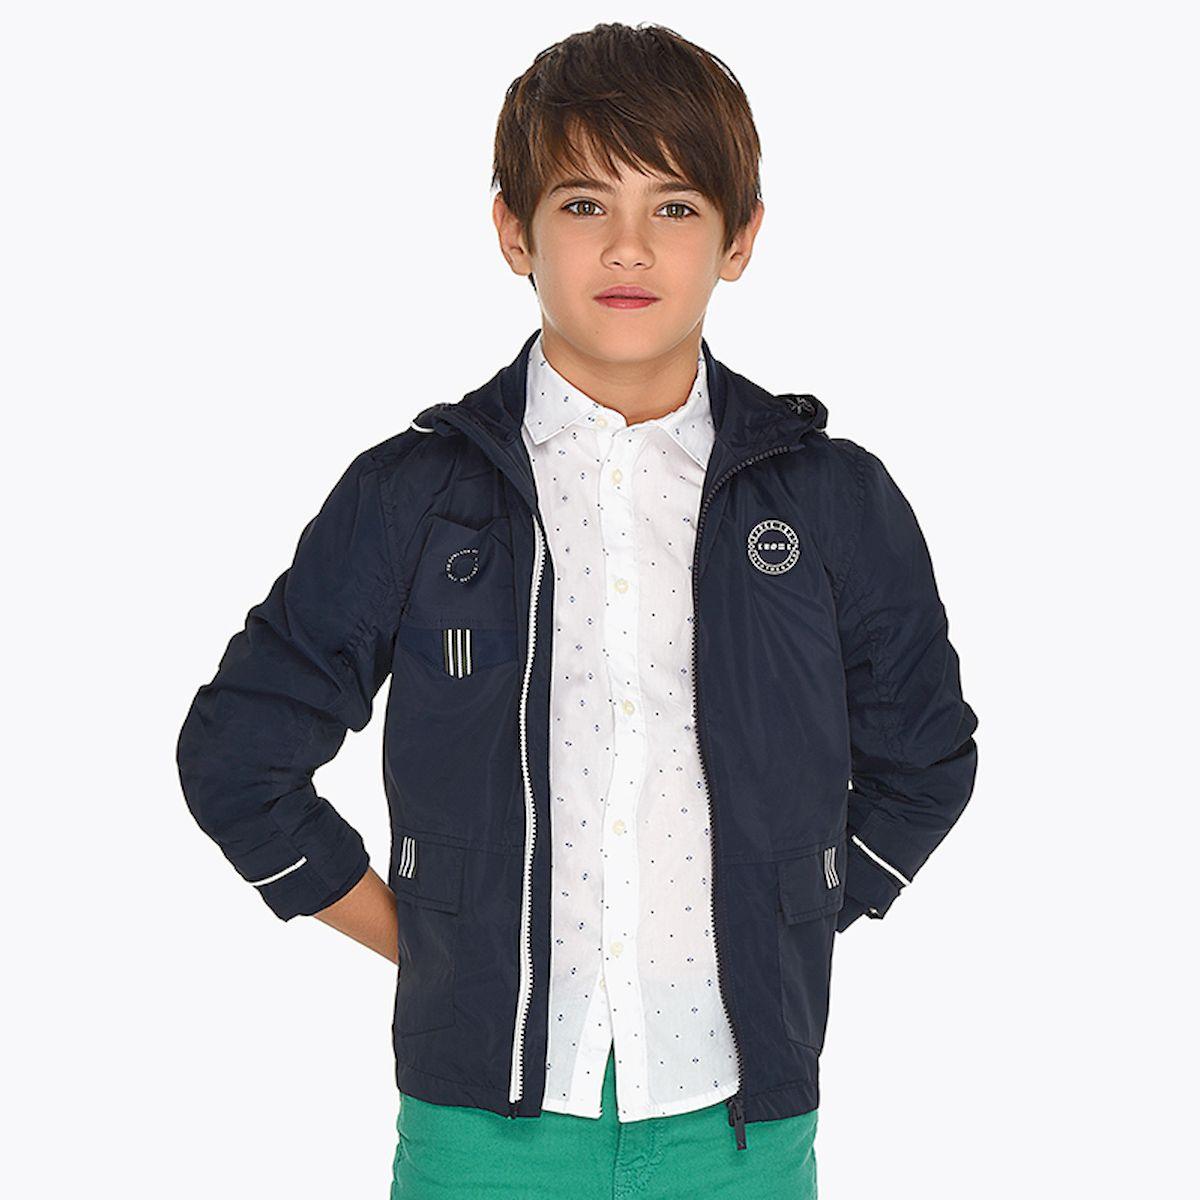 Куртка Mayoral, Nukutavake by Mayoral свитер для мальчика nukutavake by mayoral цвет темно синий 6305 77 7b размер 140 10 лет